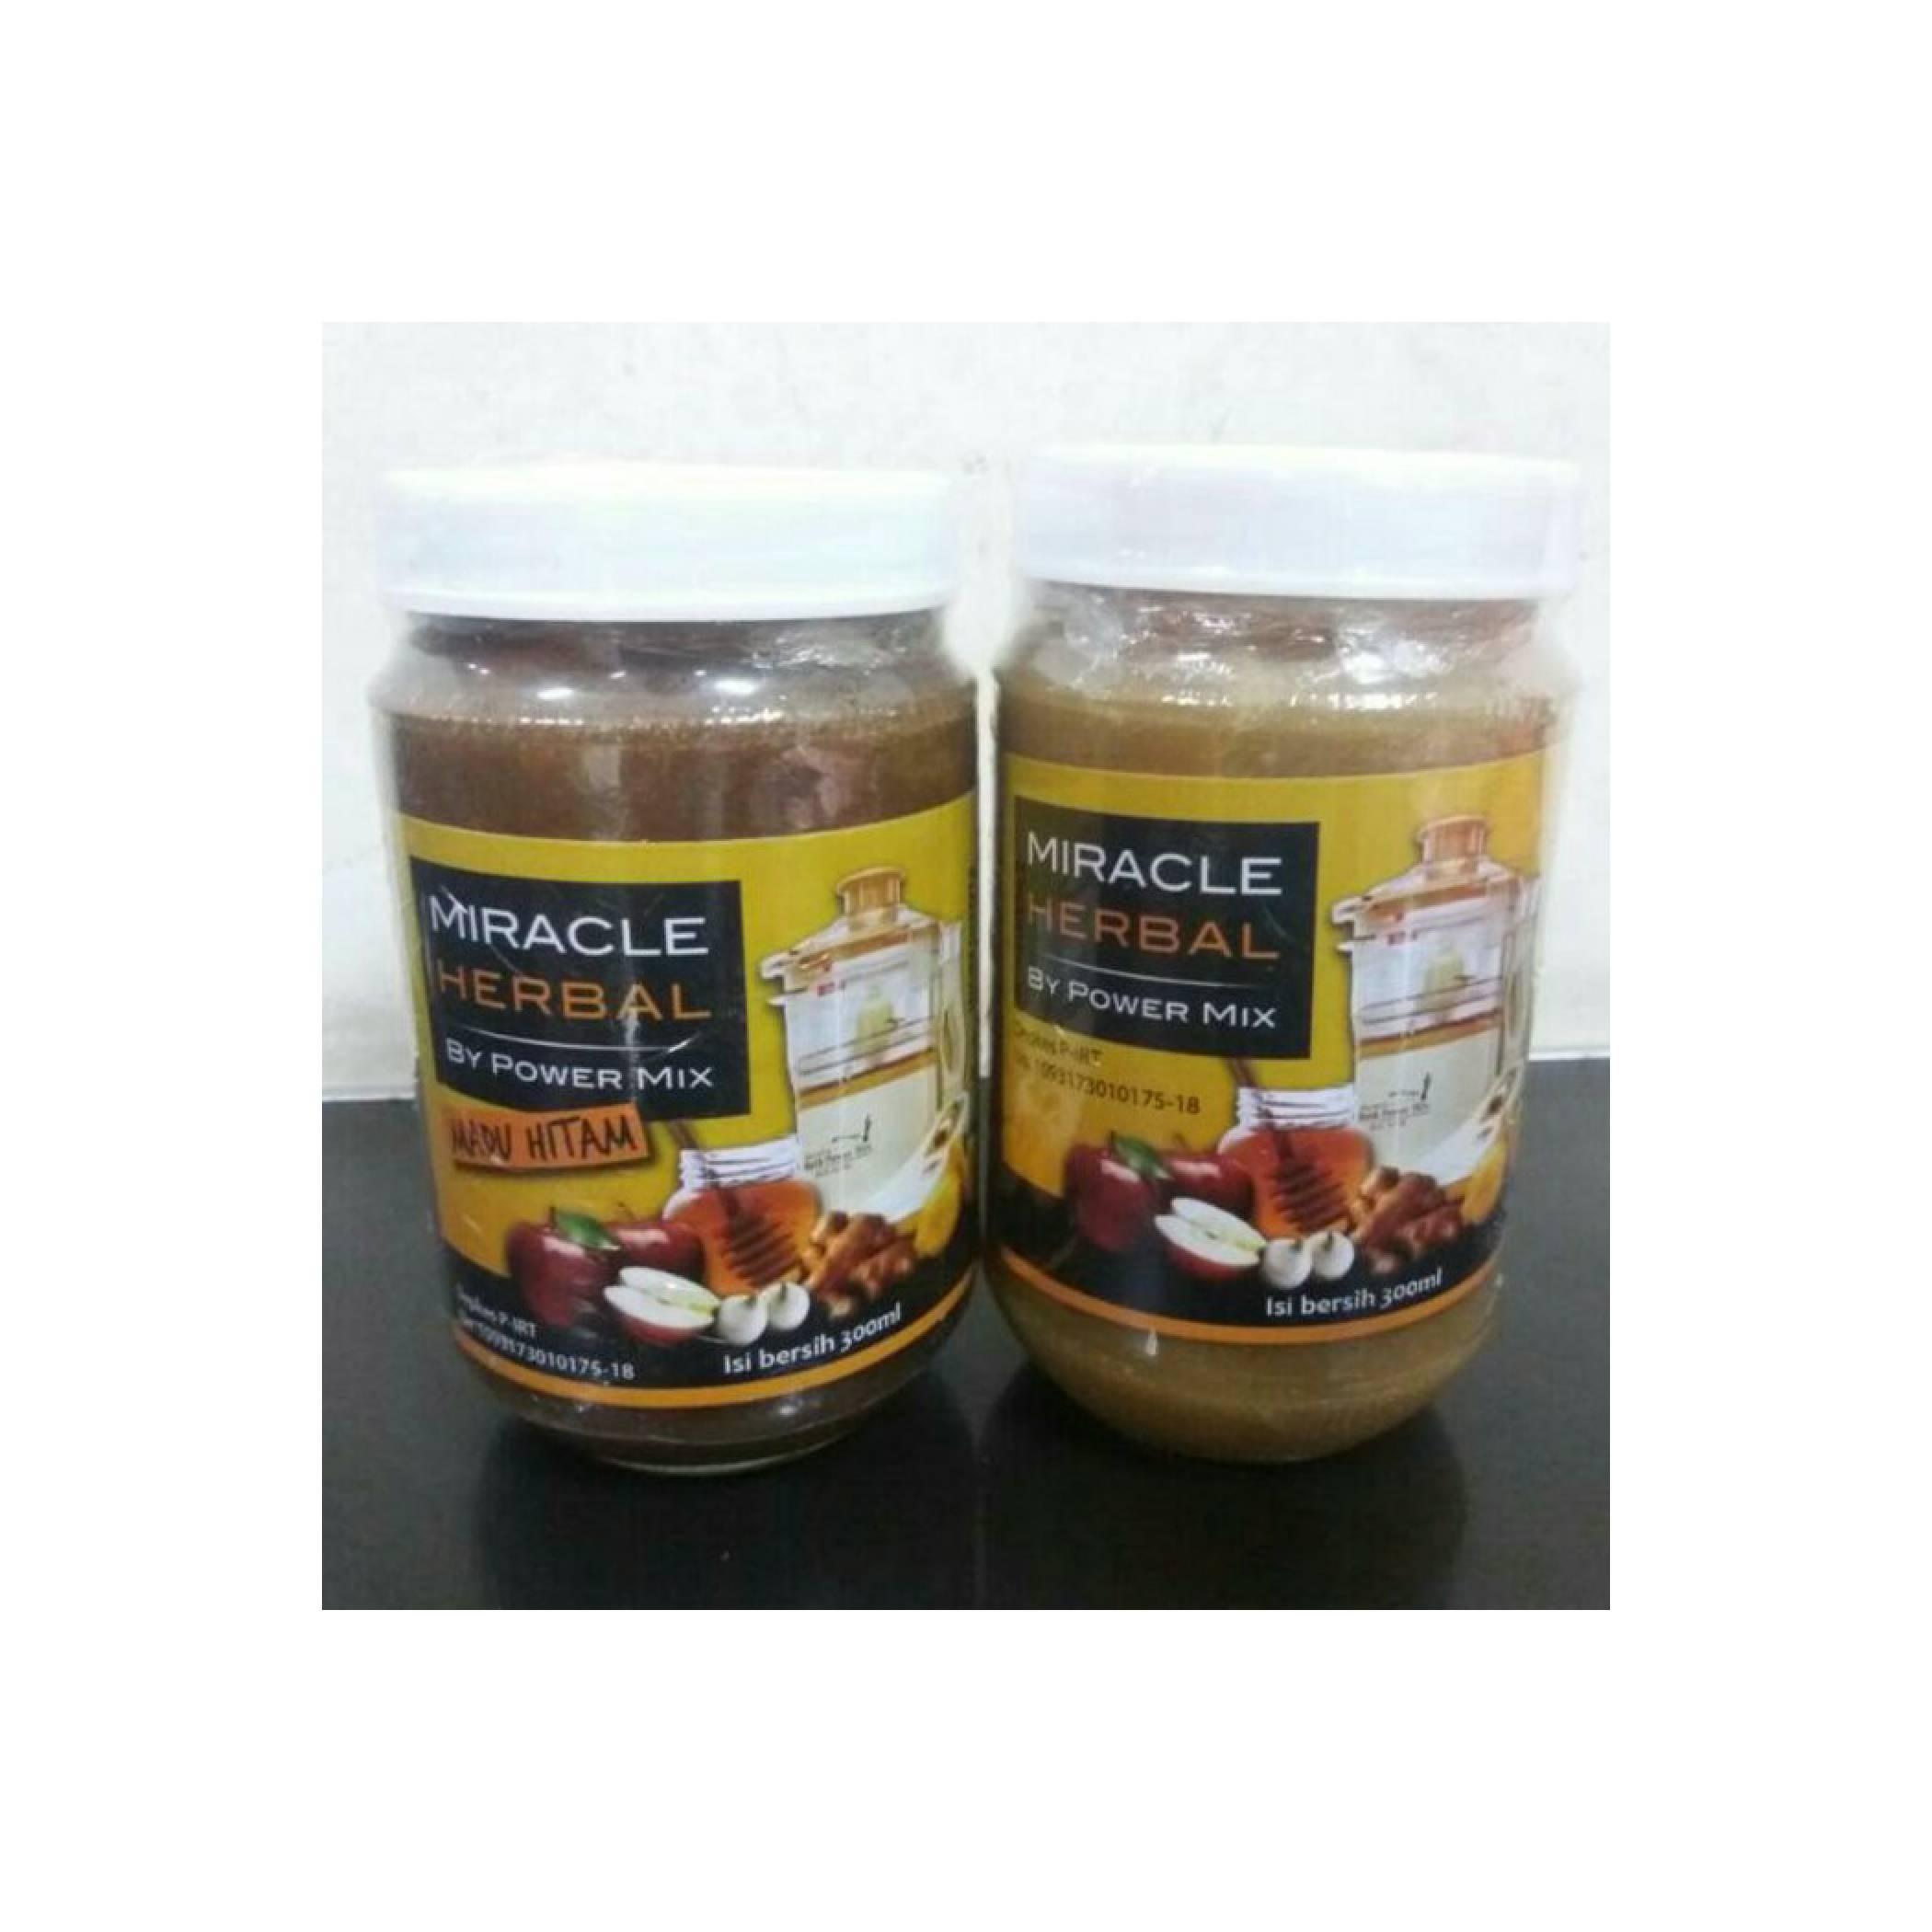 Miracle Herbal By Power Mix Madu Hitam 4 Botol Daftar Harga Bawang Putih Tunggal Jahe Merah Lemon Cuka Apel 625 Ml 6 Bt Detoxificationidr1400000 Rp 1760000